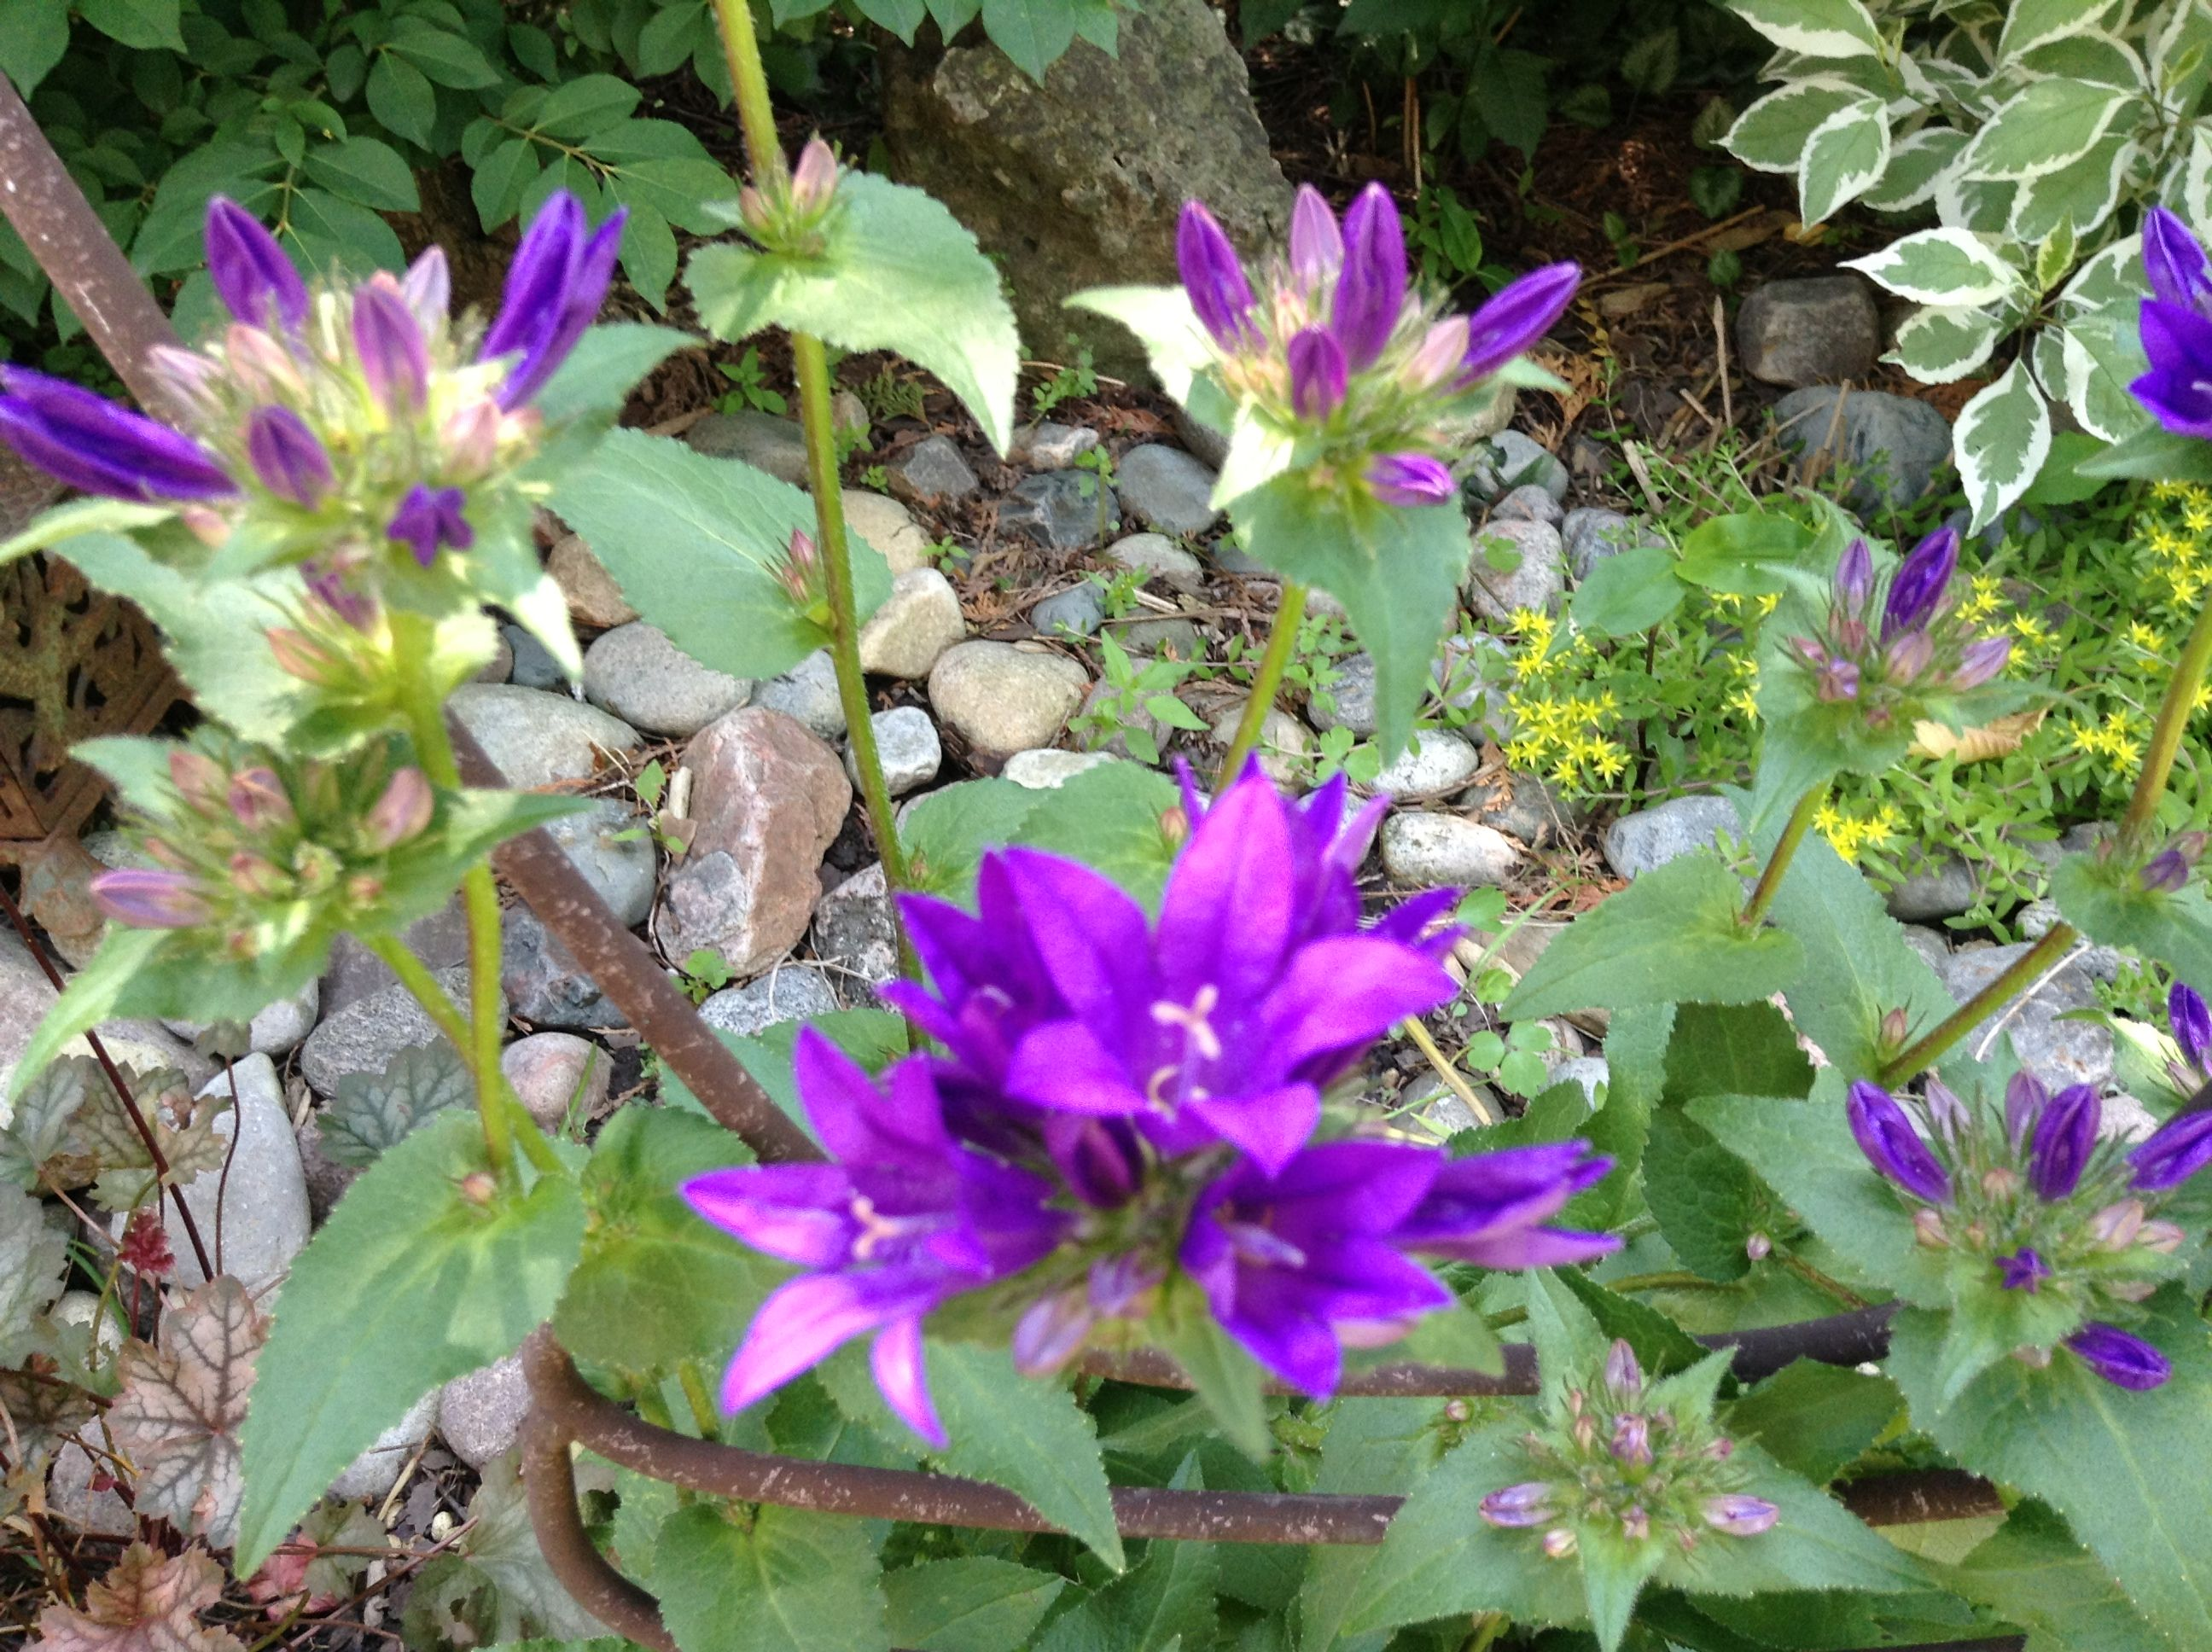 Blue Anemone from my garden